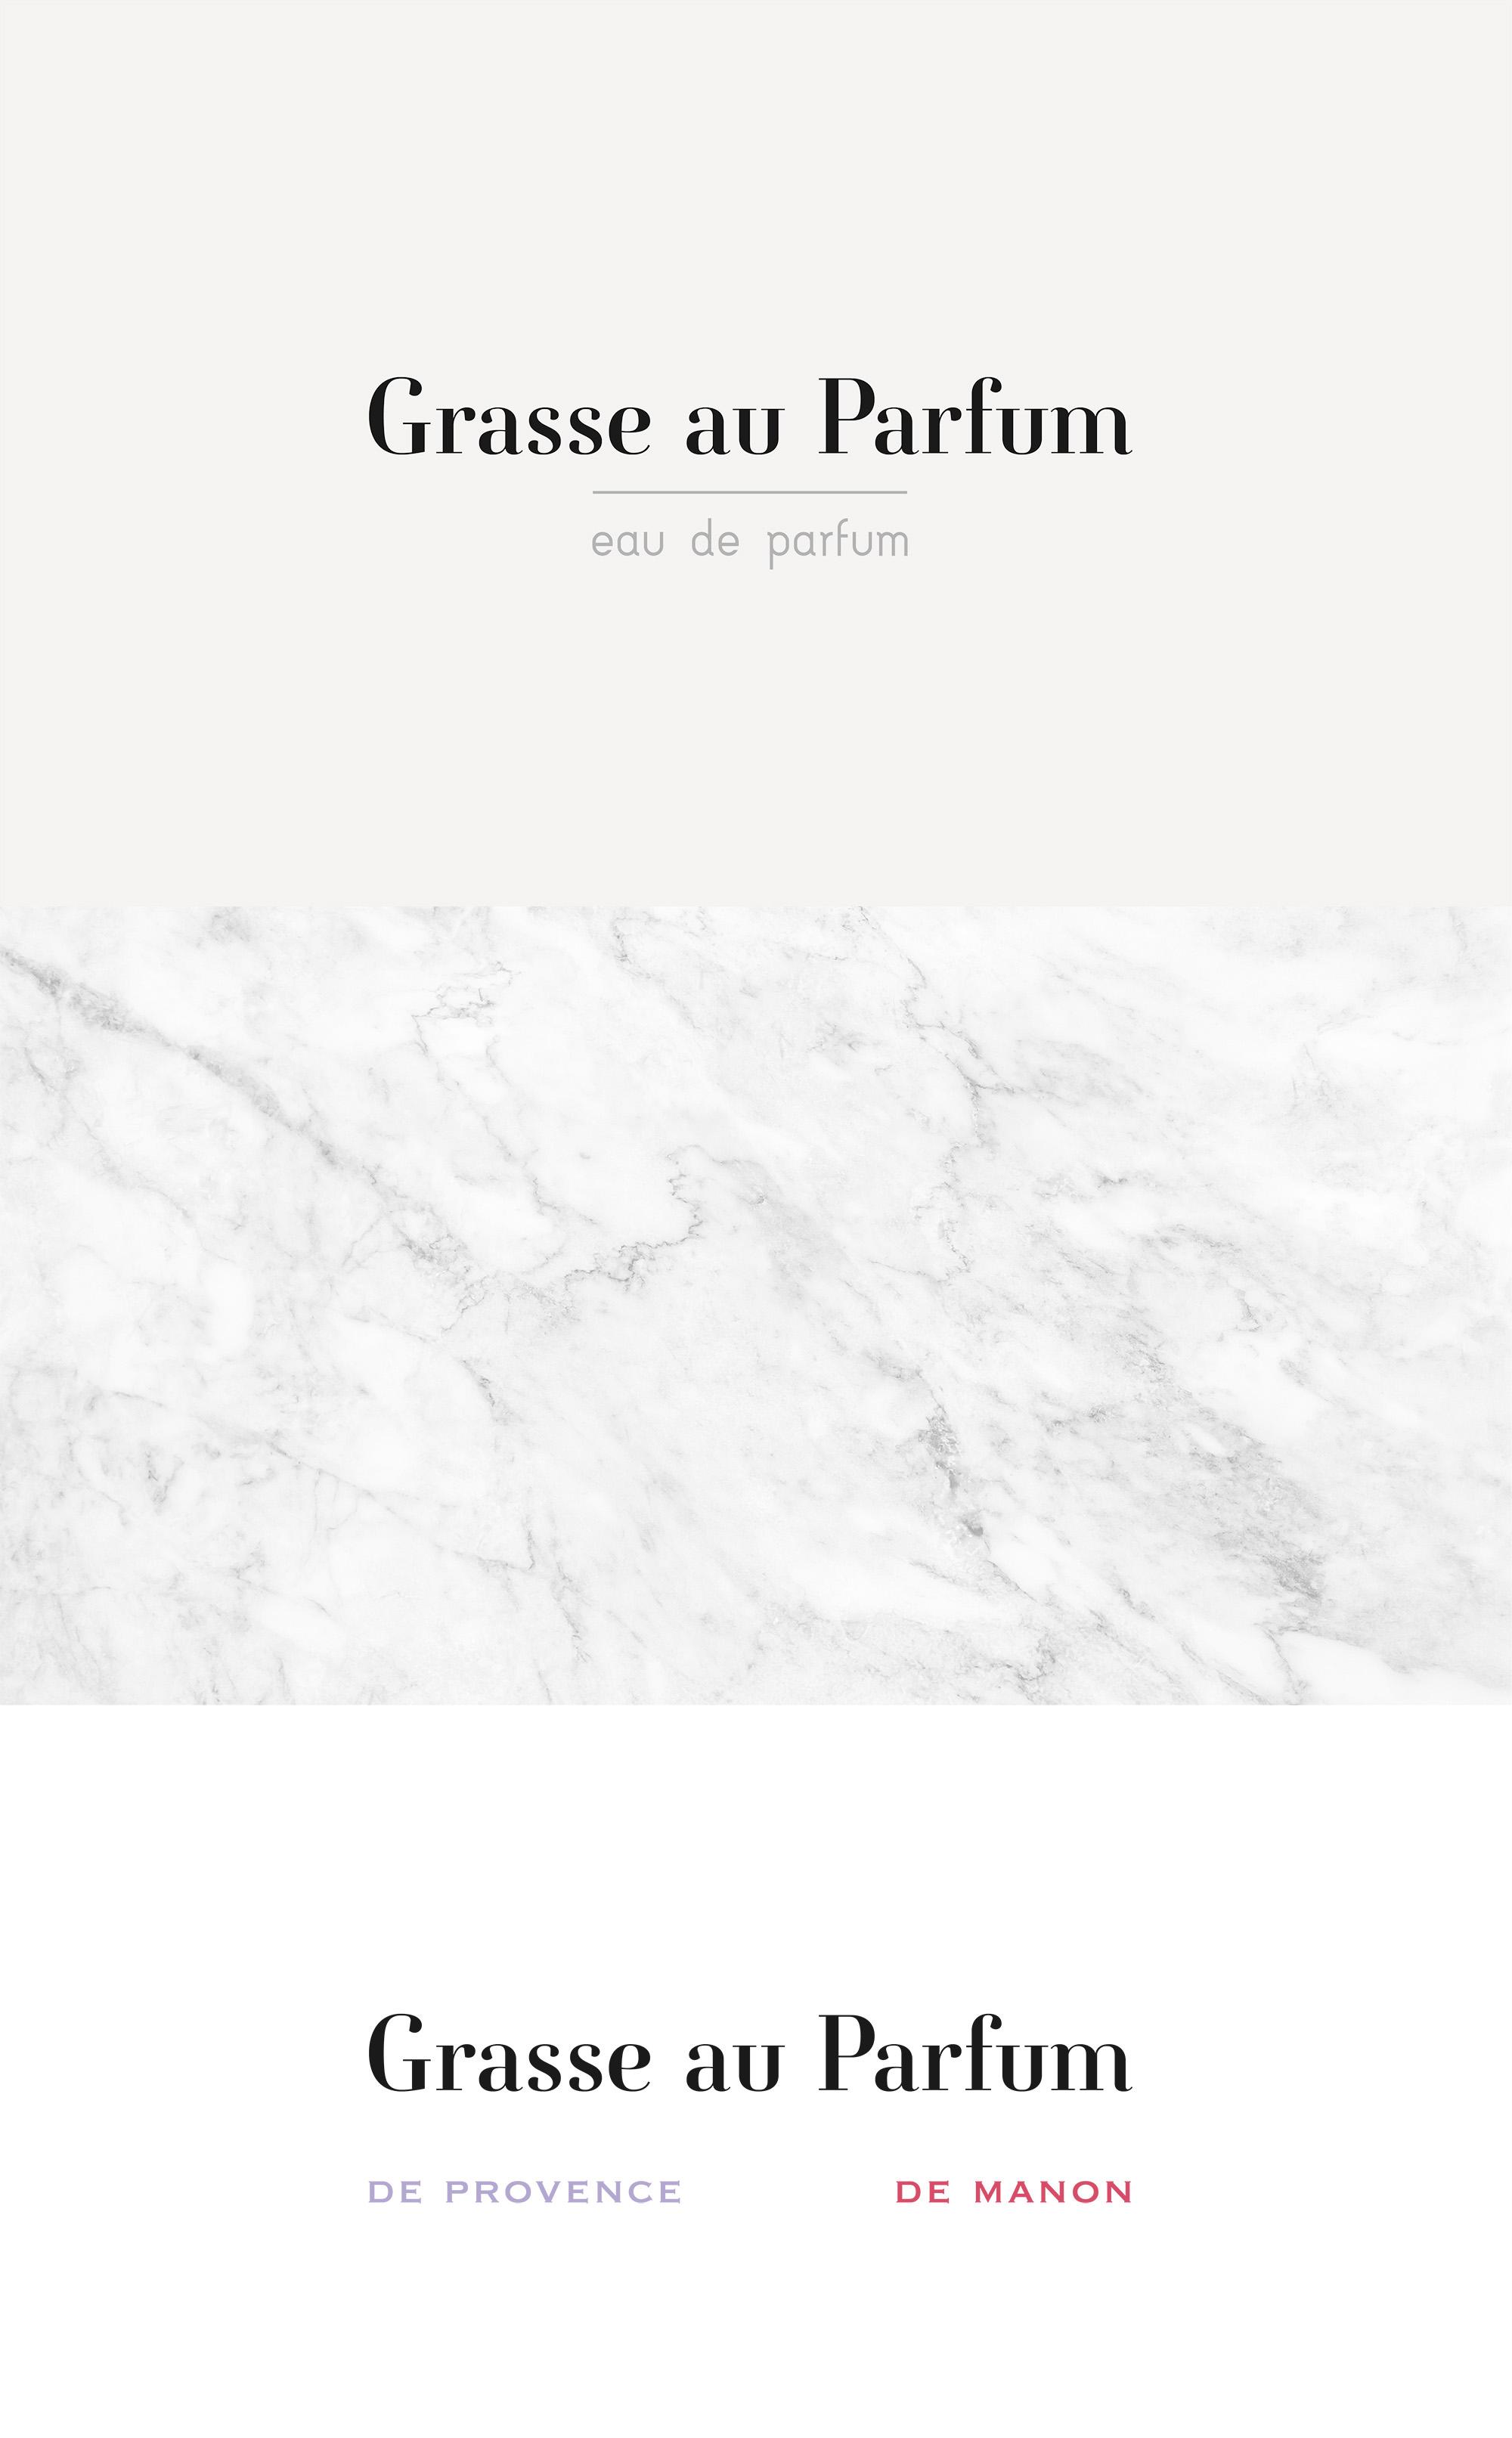 LOGO-MARQUE-IDENTITE-VISUELLE-PARFUM-CHARTE GRAPHIQUE-CREATION